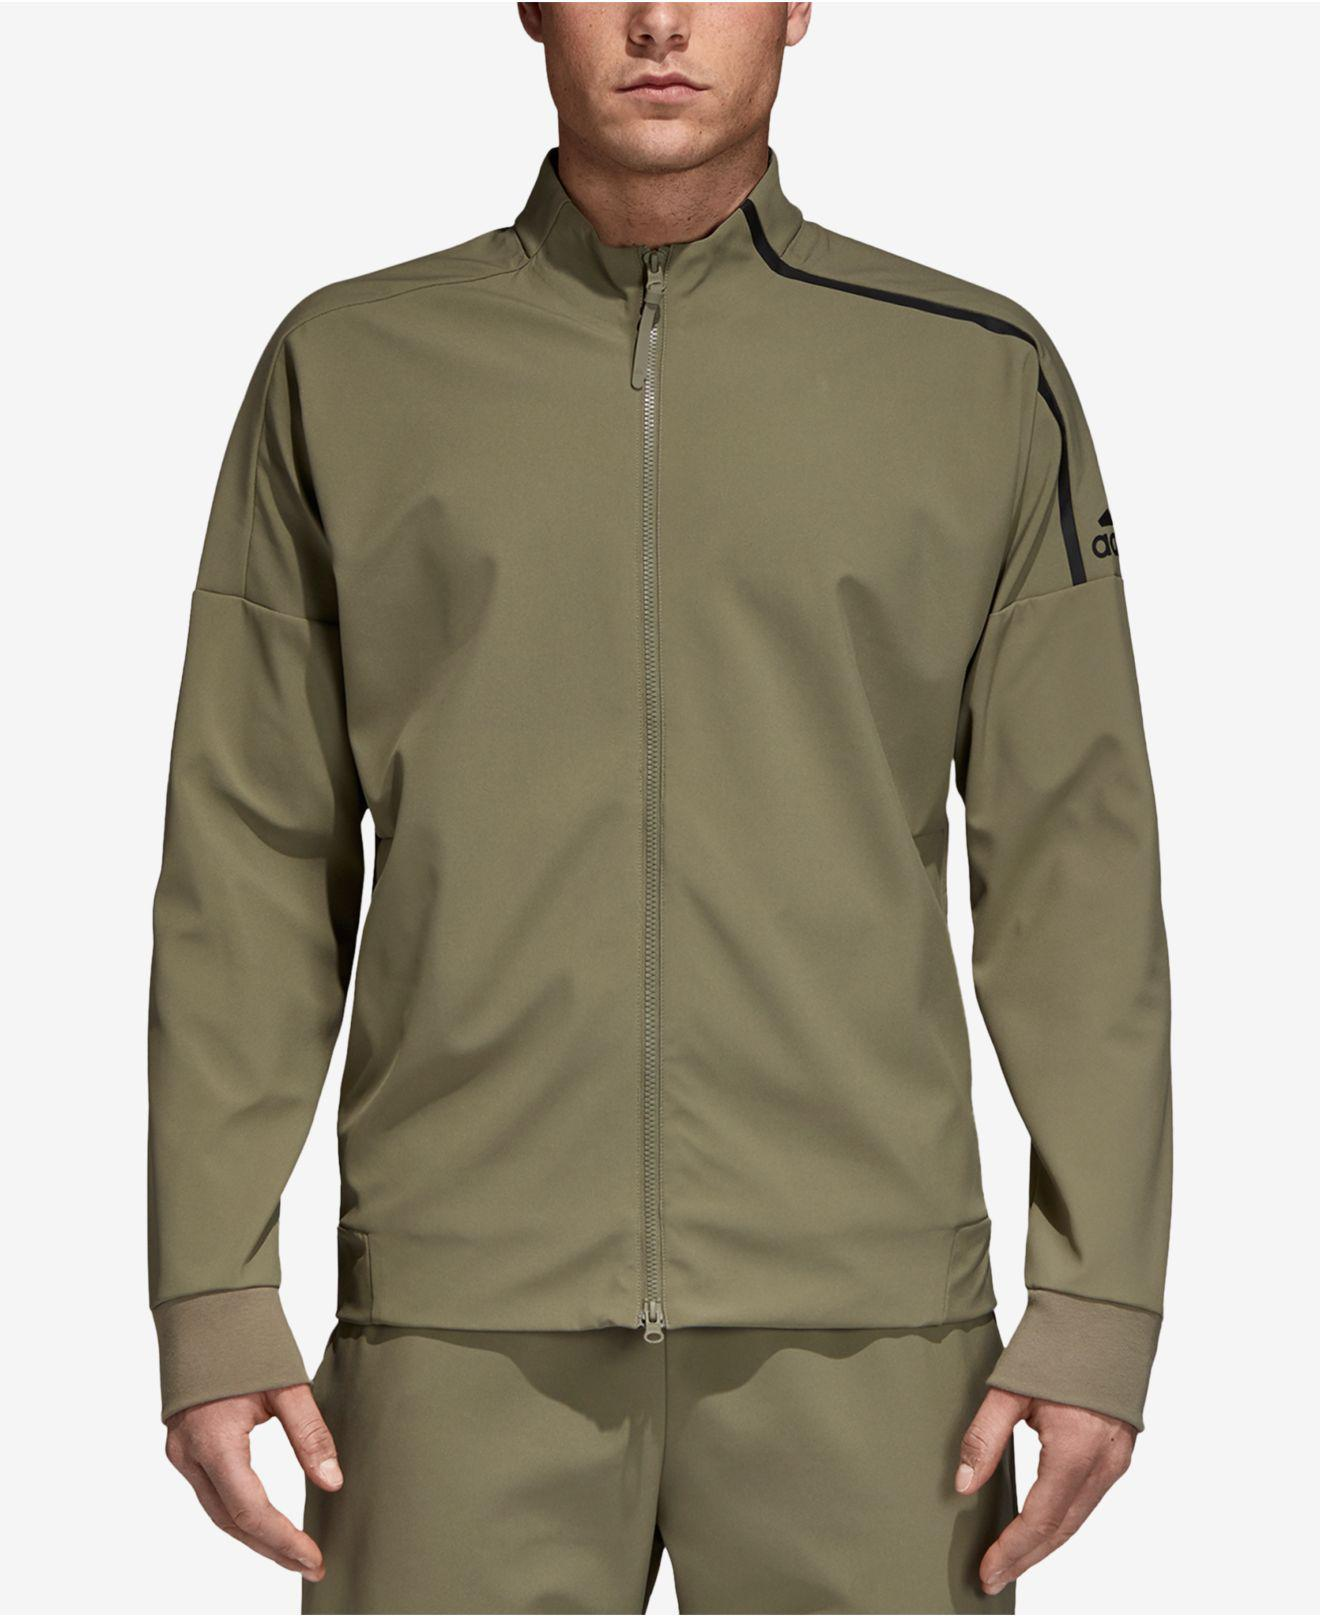 118f7aa871af Lyst Adidas Z N E Track Jacket In Green For Men. Adidas Solid Blackbird  Black White ...